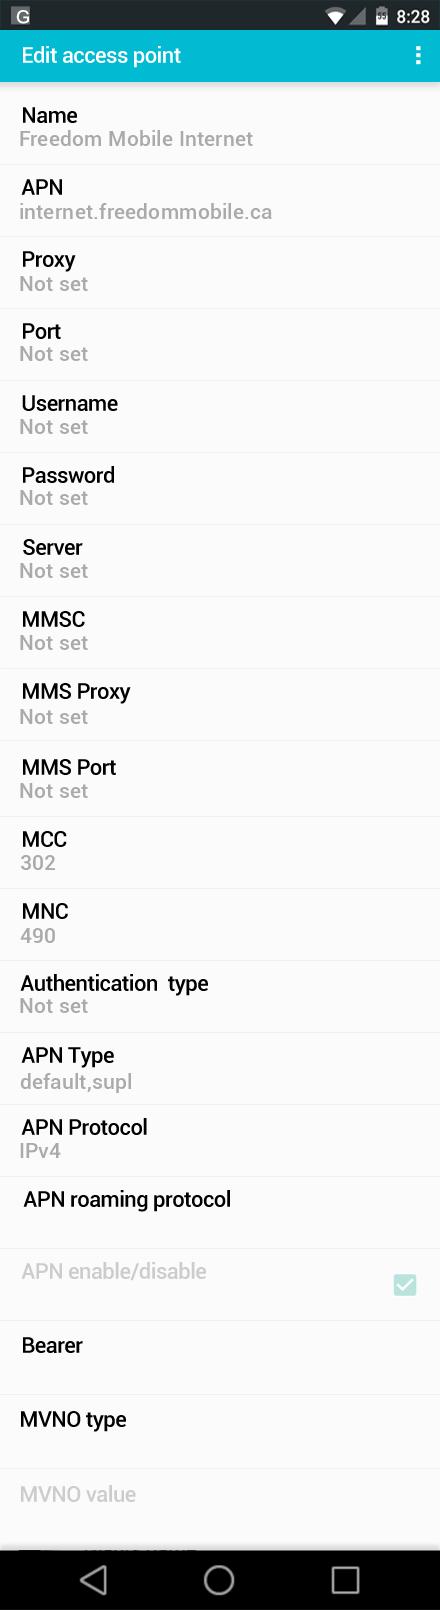 Freedom Mobile Internet APN settings for Android screenshot